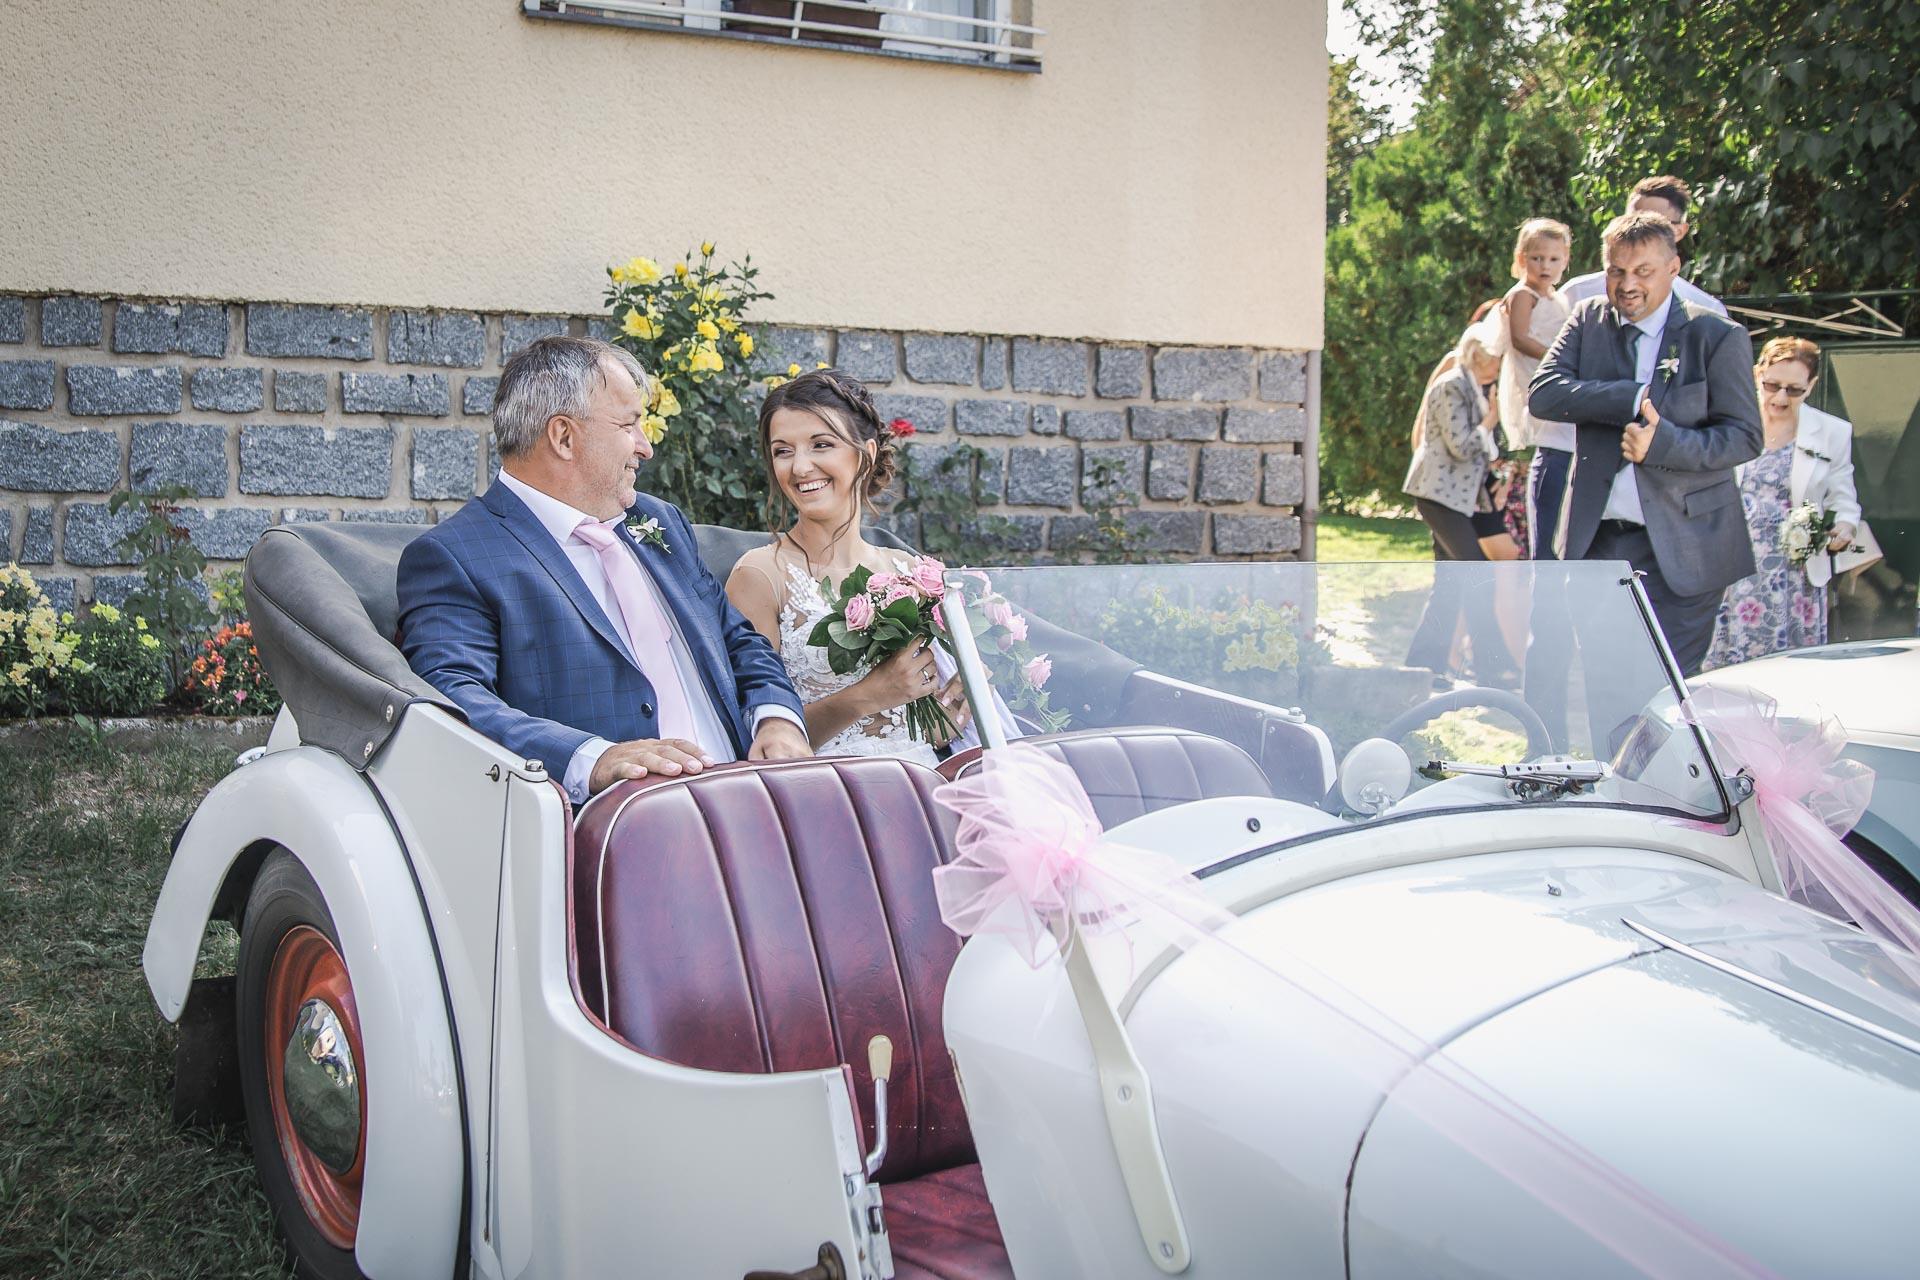 svatební-fotograf-wedding-svatebni-video-orlík-vltava-kostel-statek-stodola-boho-svatba-Beautyfoto-171